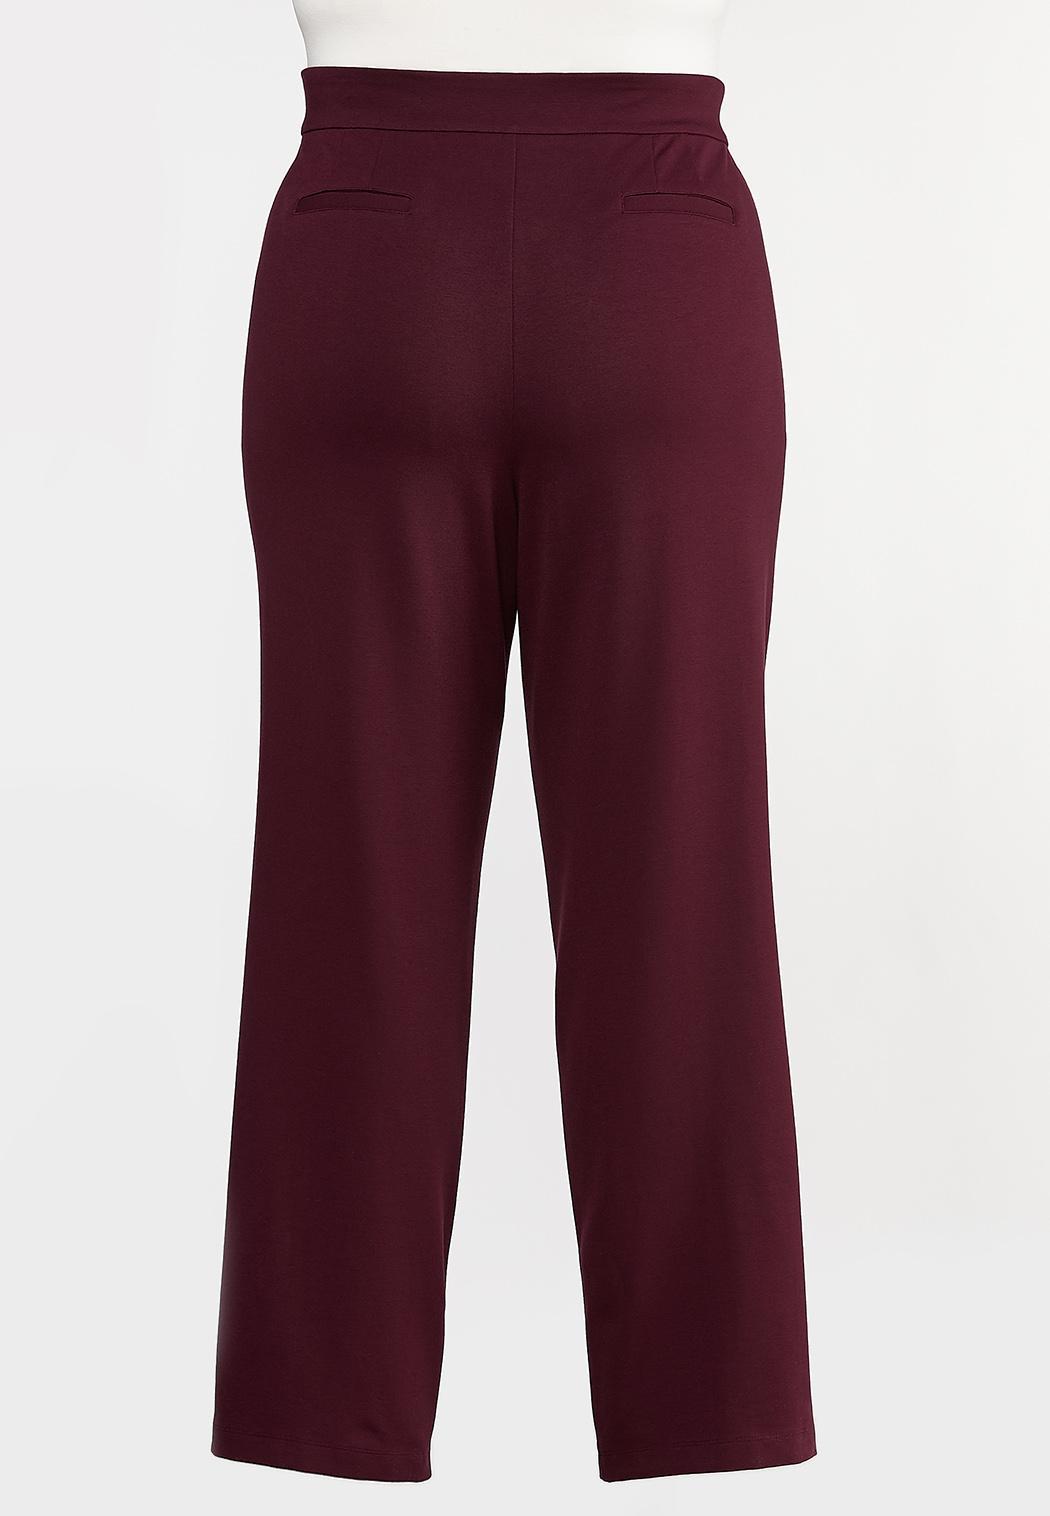 Plus Petite Straight Leg Ponte Pants (Item #44317463)